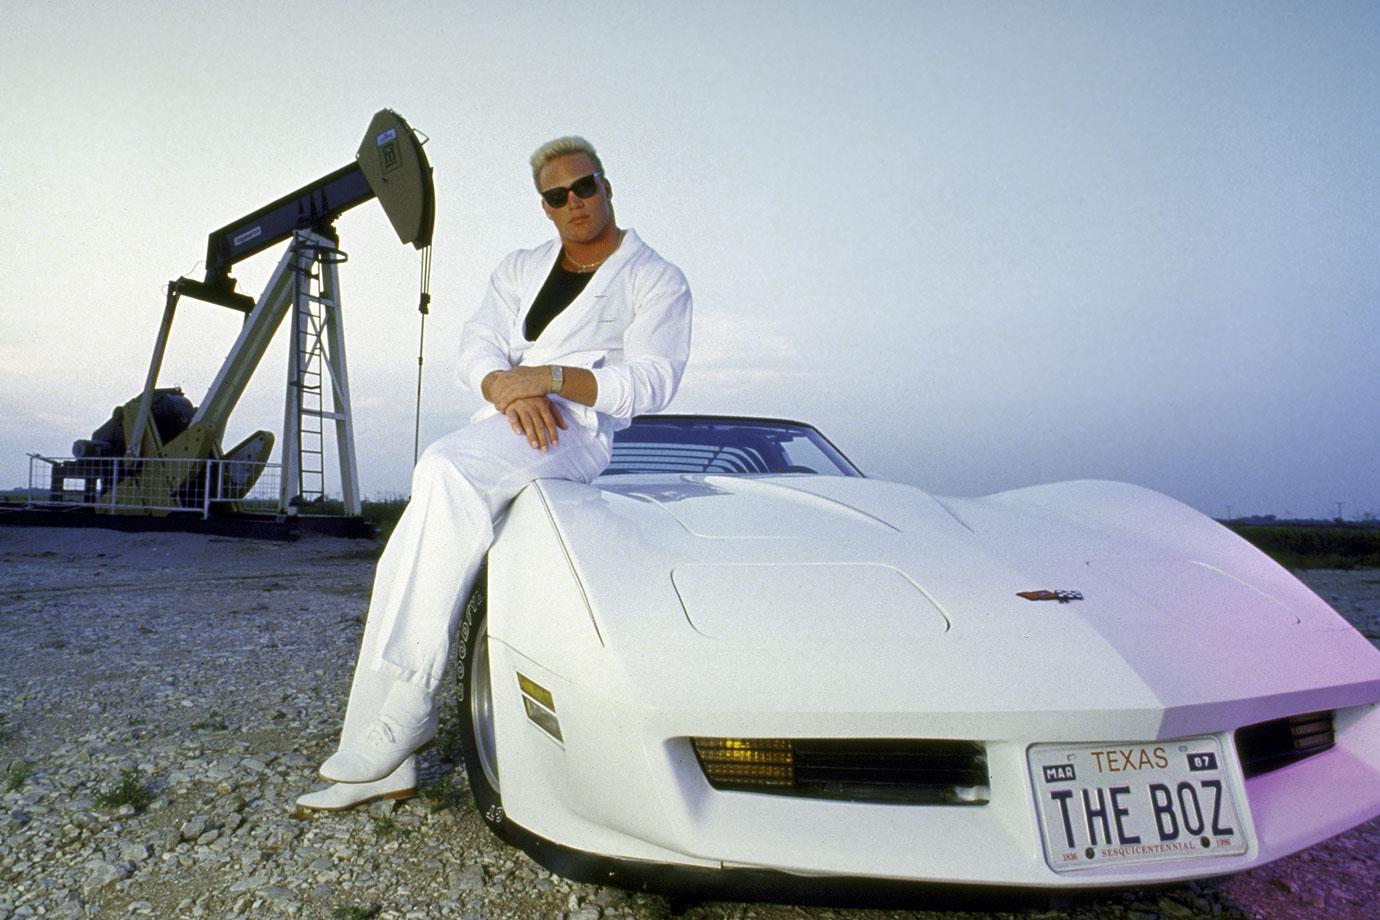 Brian Bosworth leans against his white Corvette.